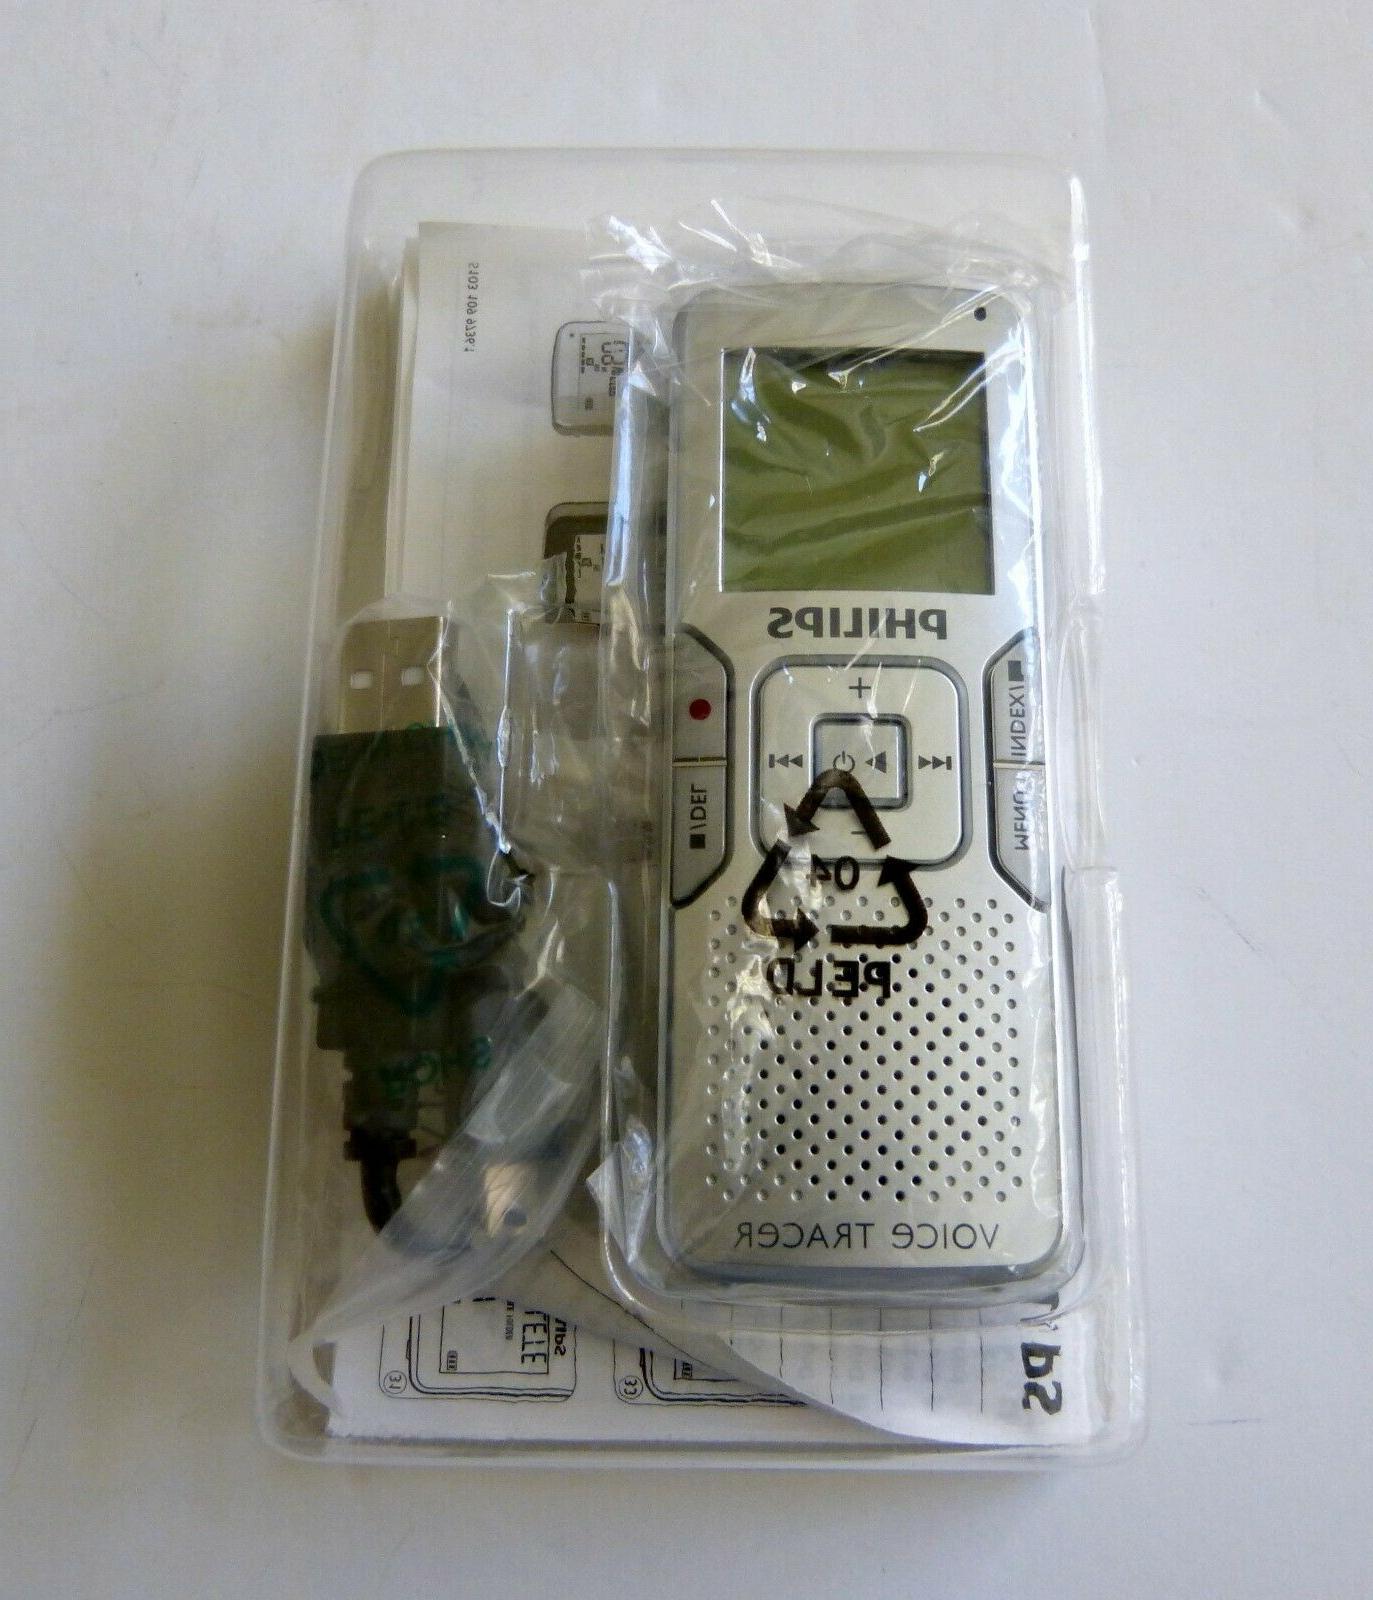 Philips Digital Voice LFH0662/40